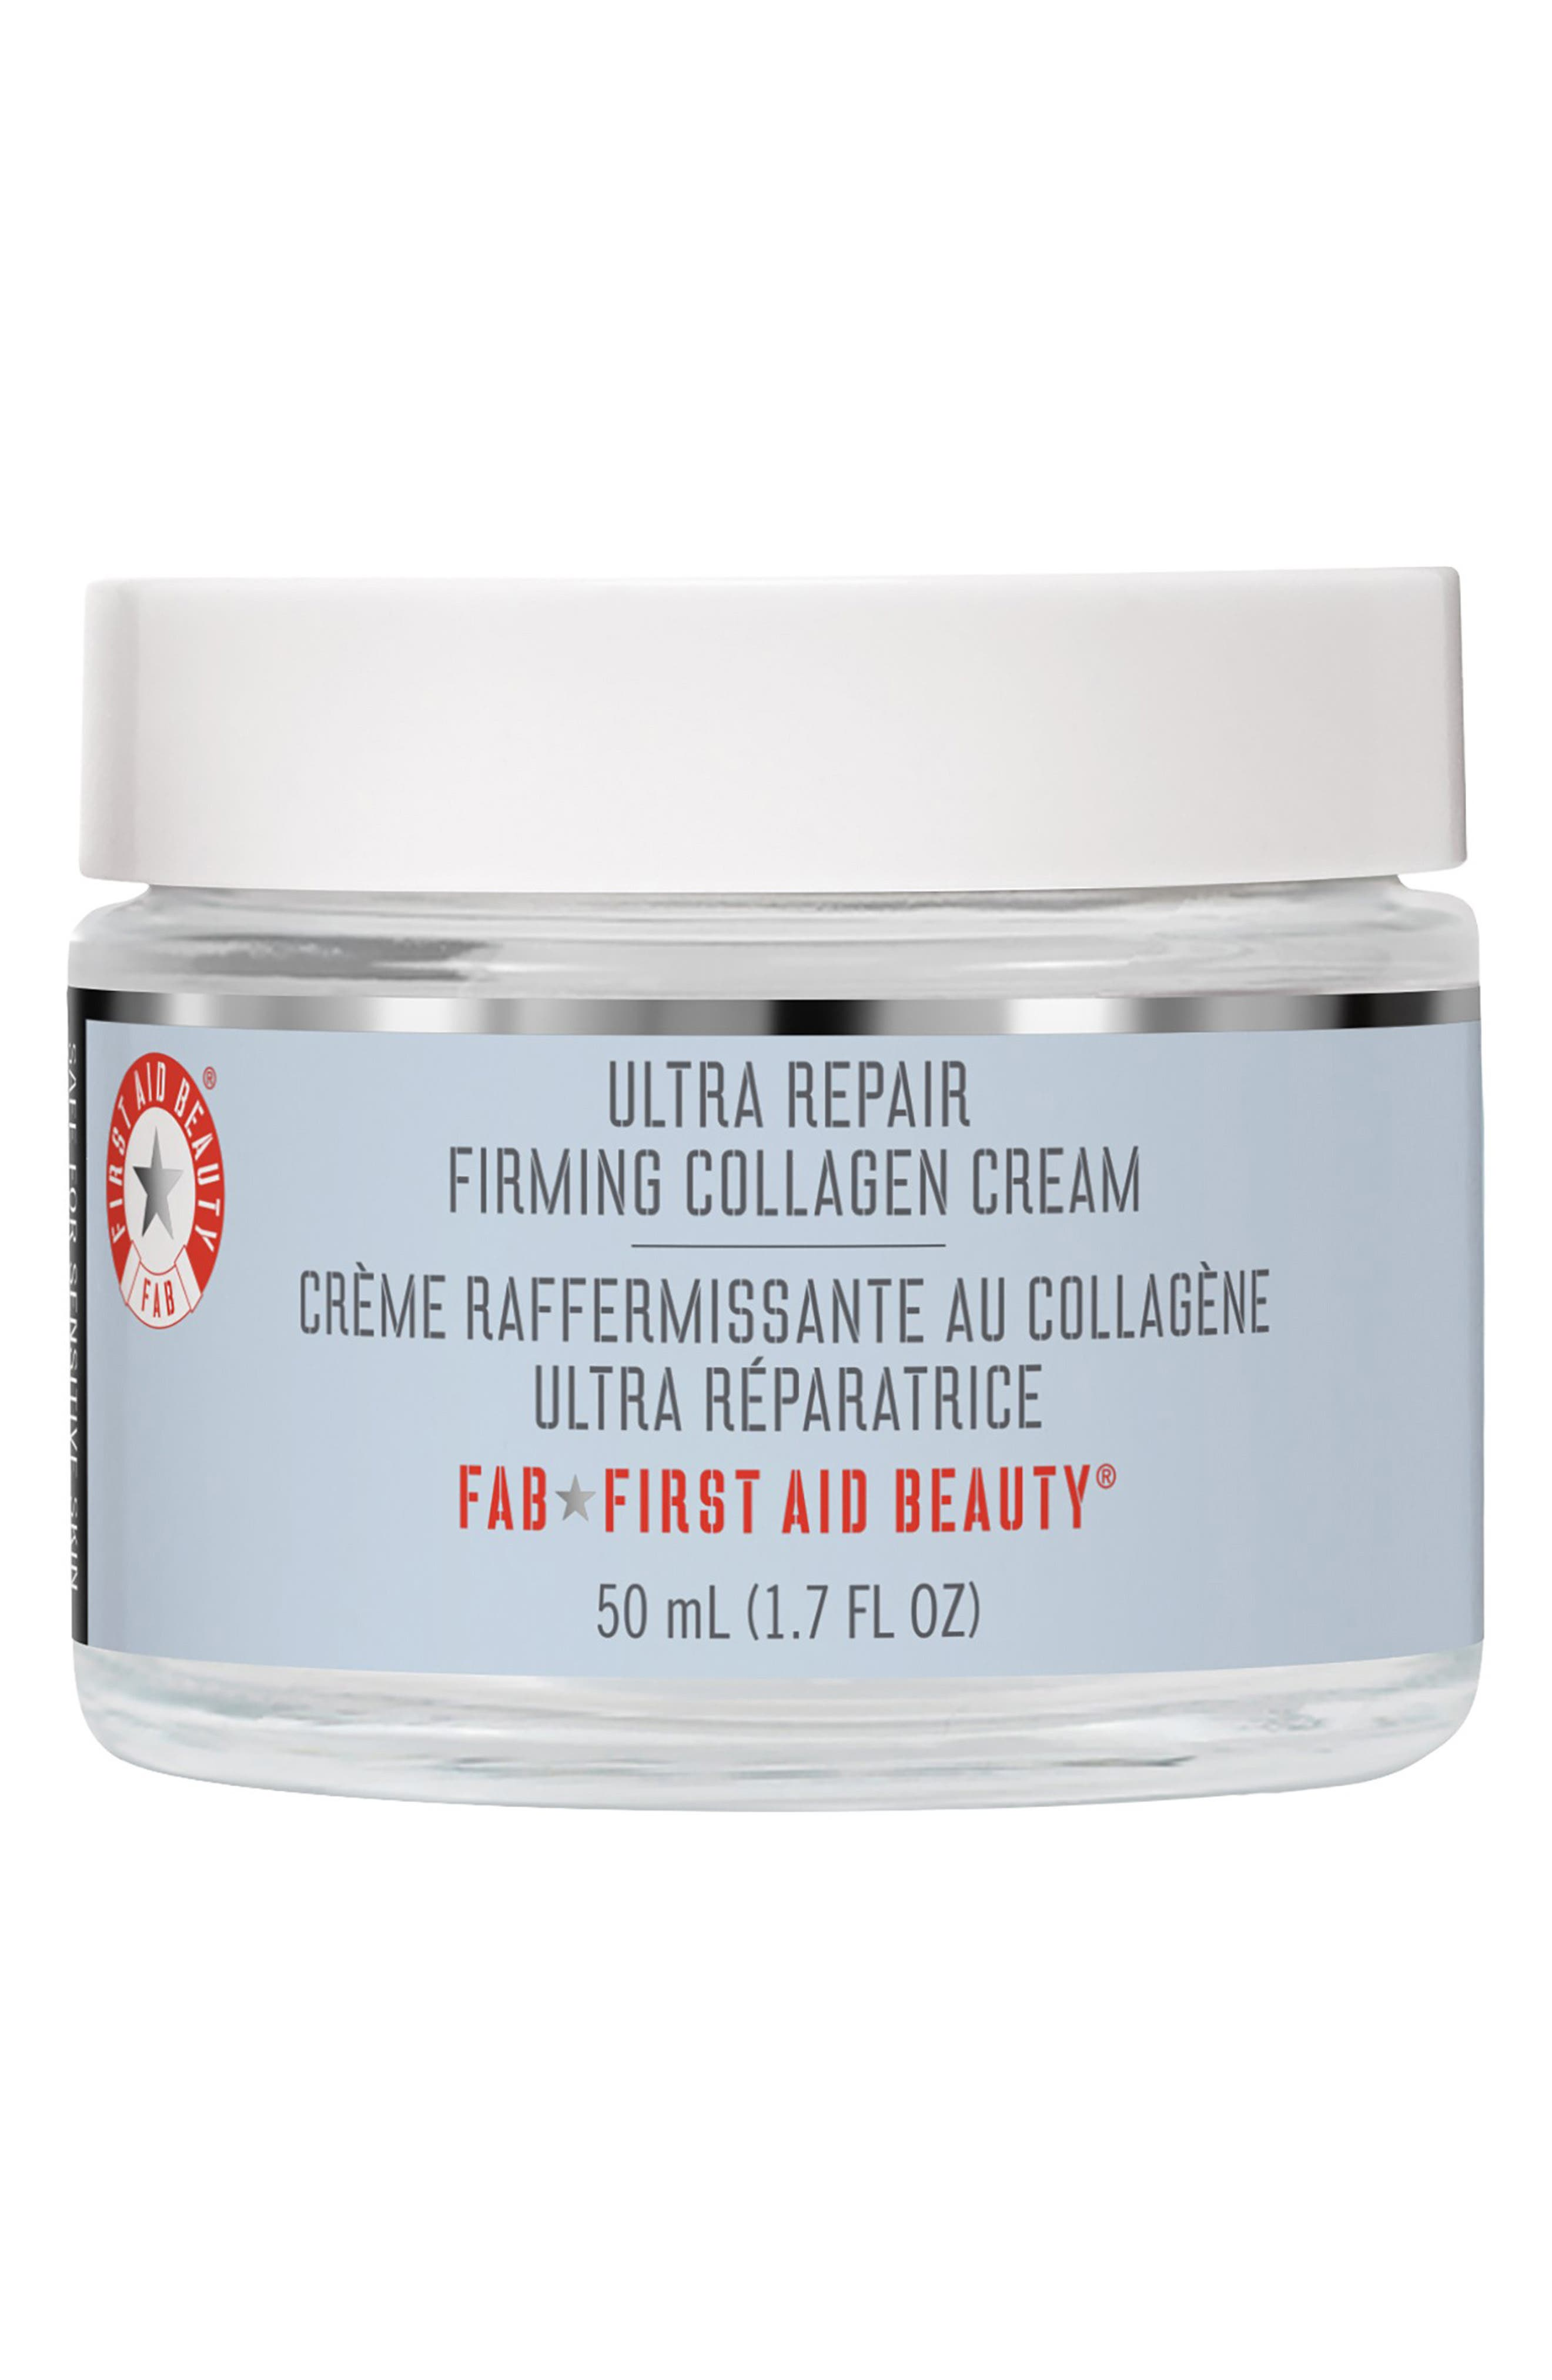 Ultra Repair Firming Collagen Cream | Nordstrom